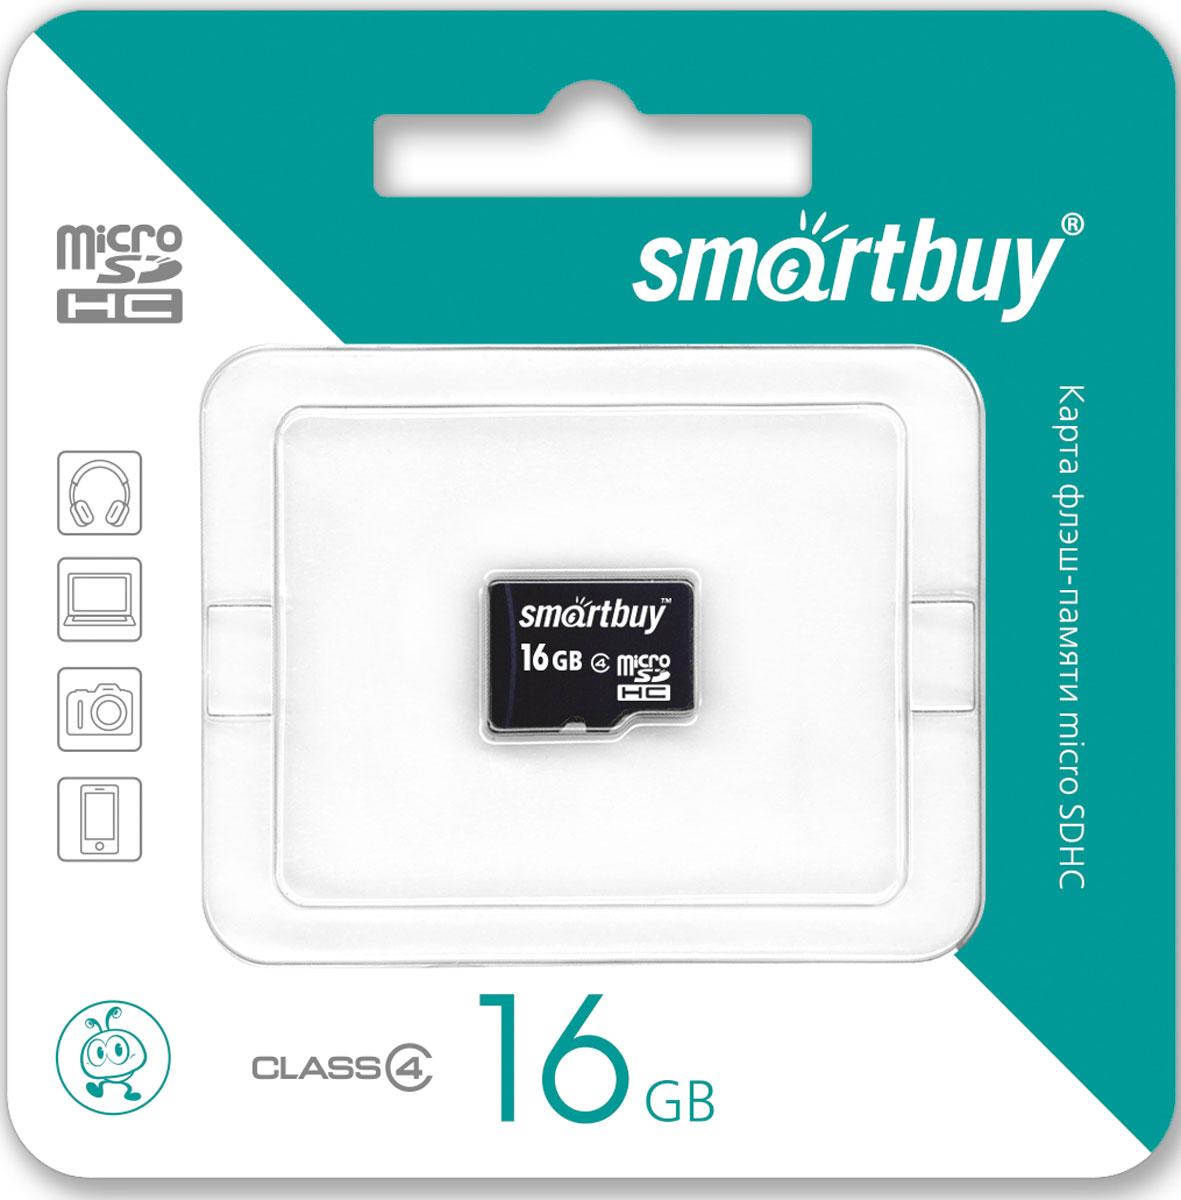 SmartBuy microSDHC Class 4 16GB карта памяти (без адаптера)